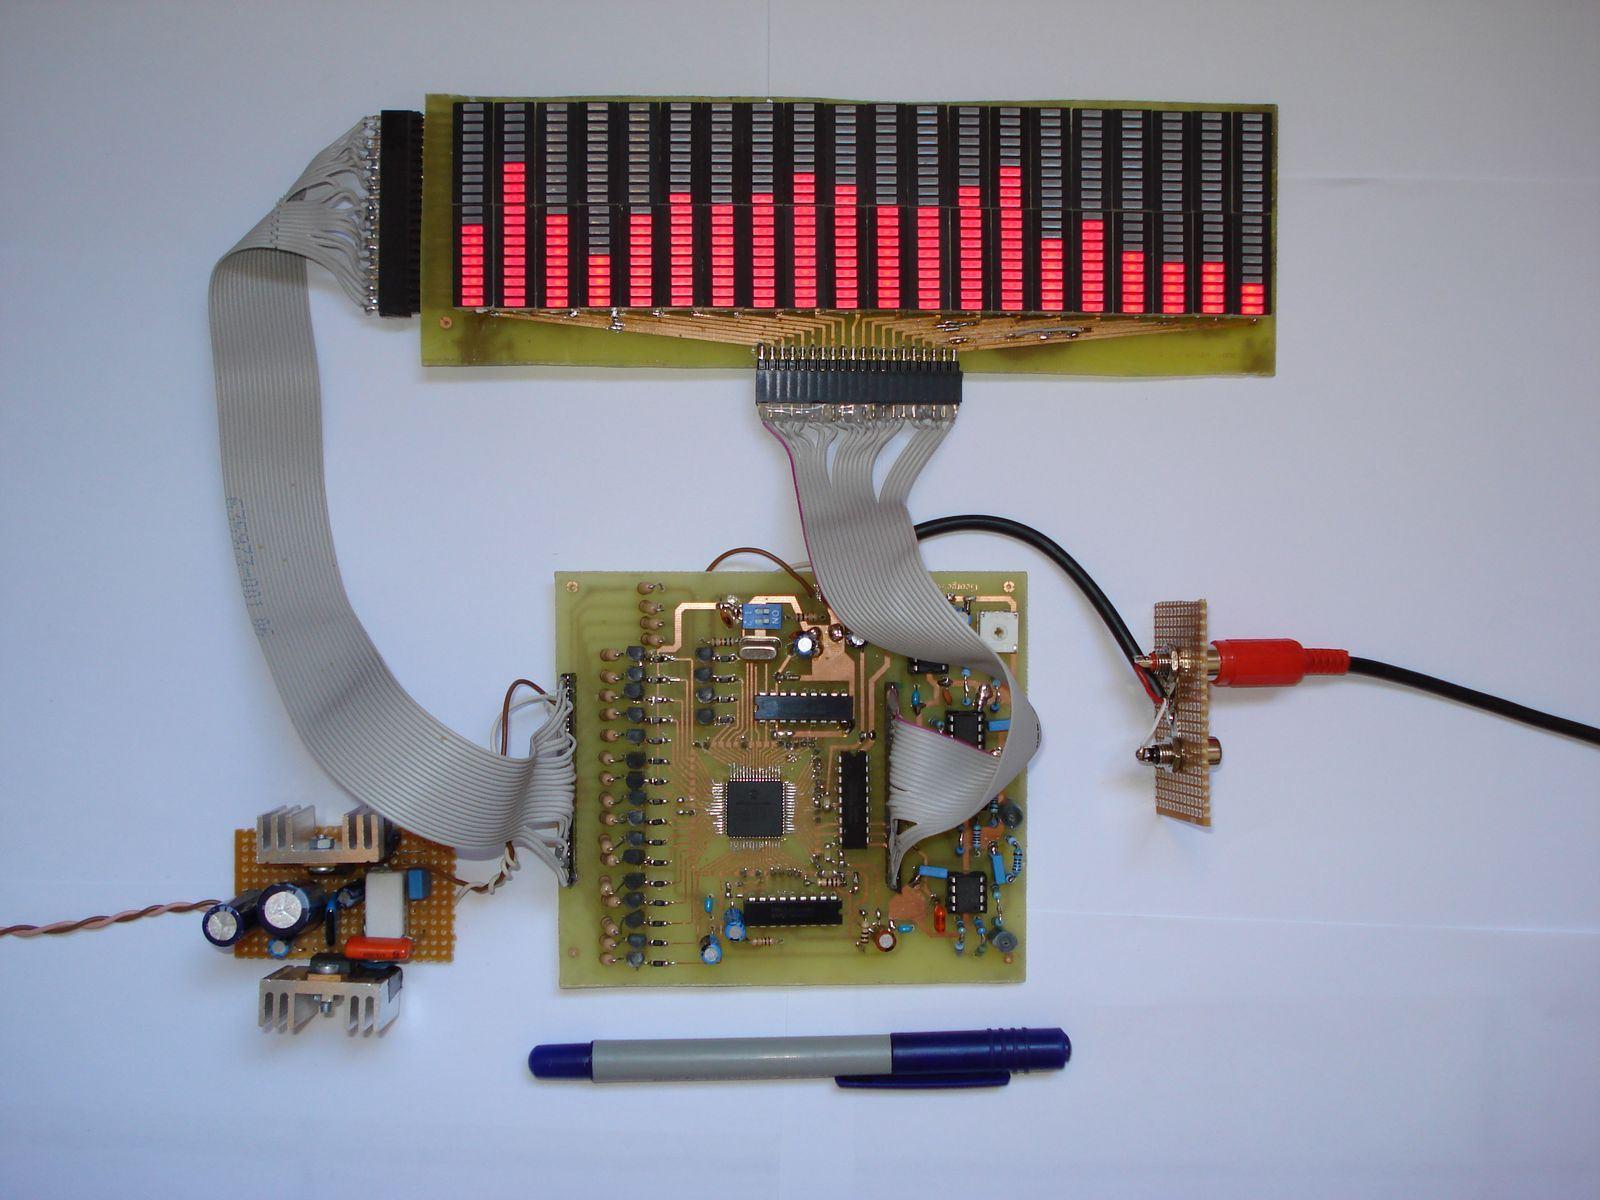 Аудио анализатор спектра схема 27 фотография